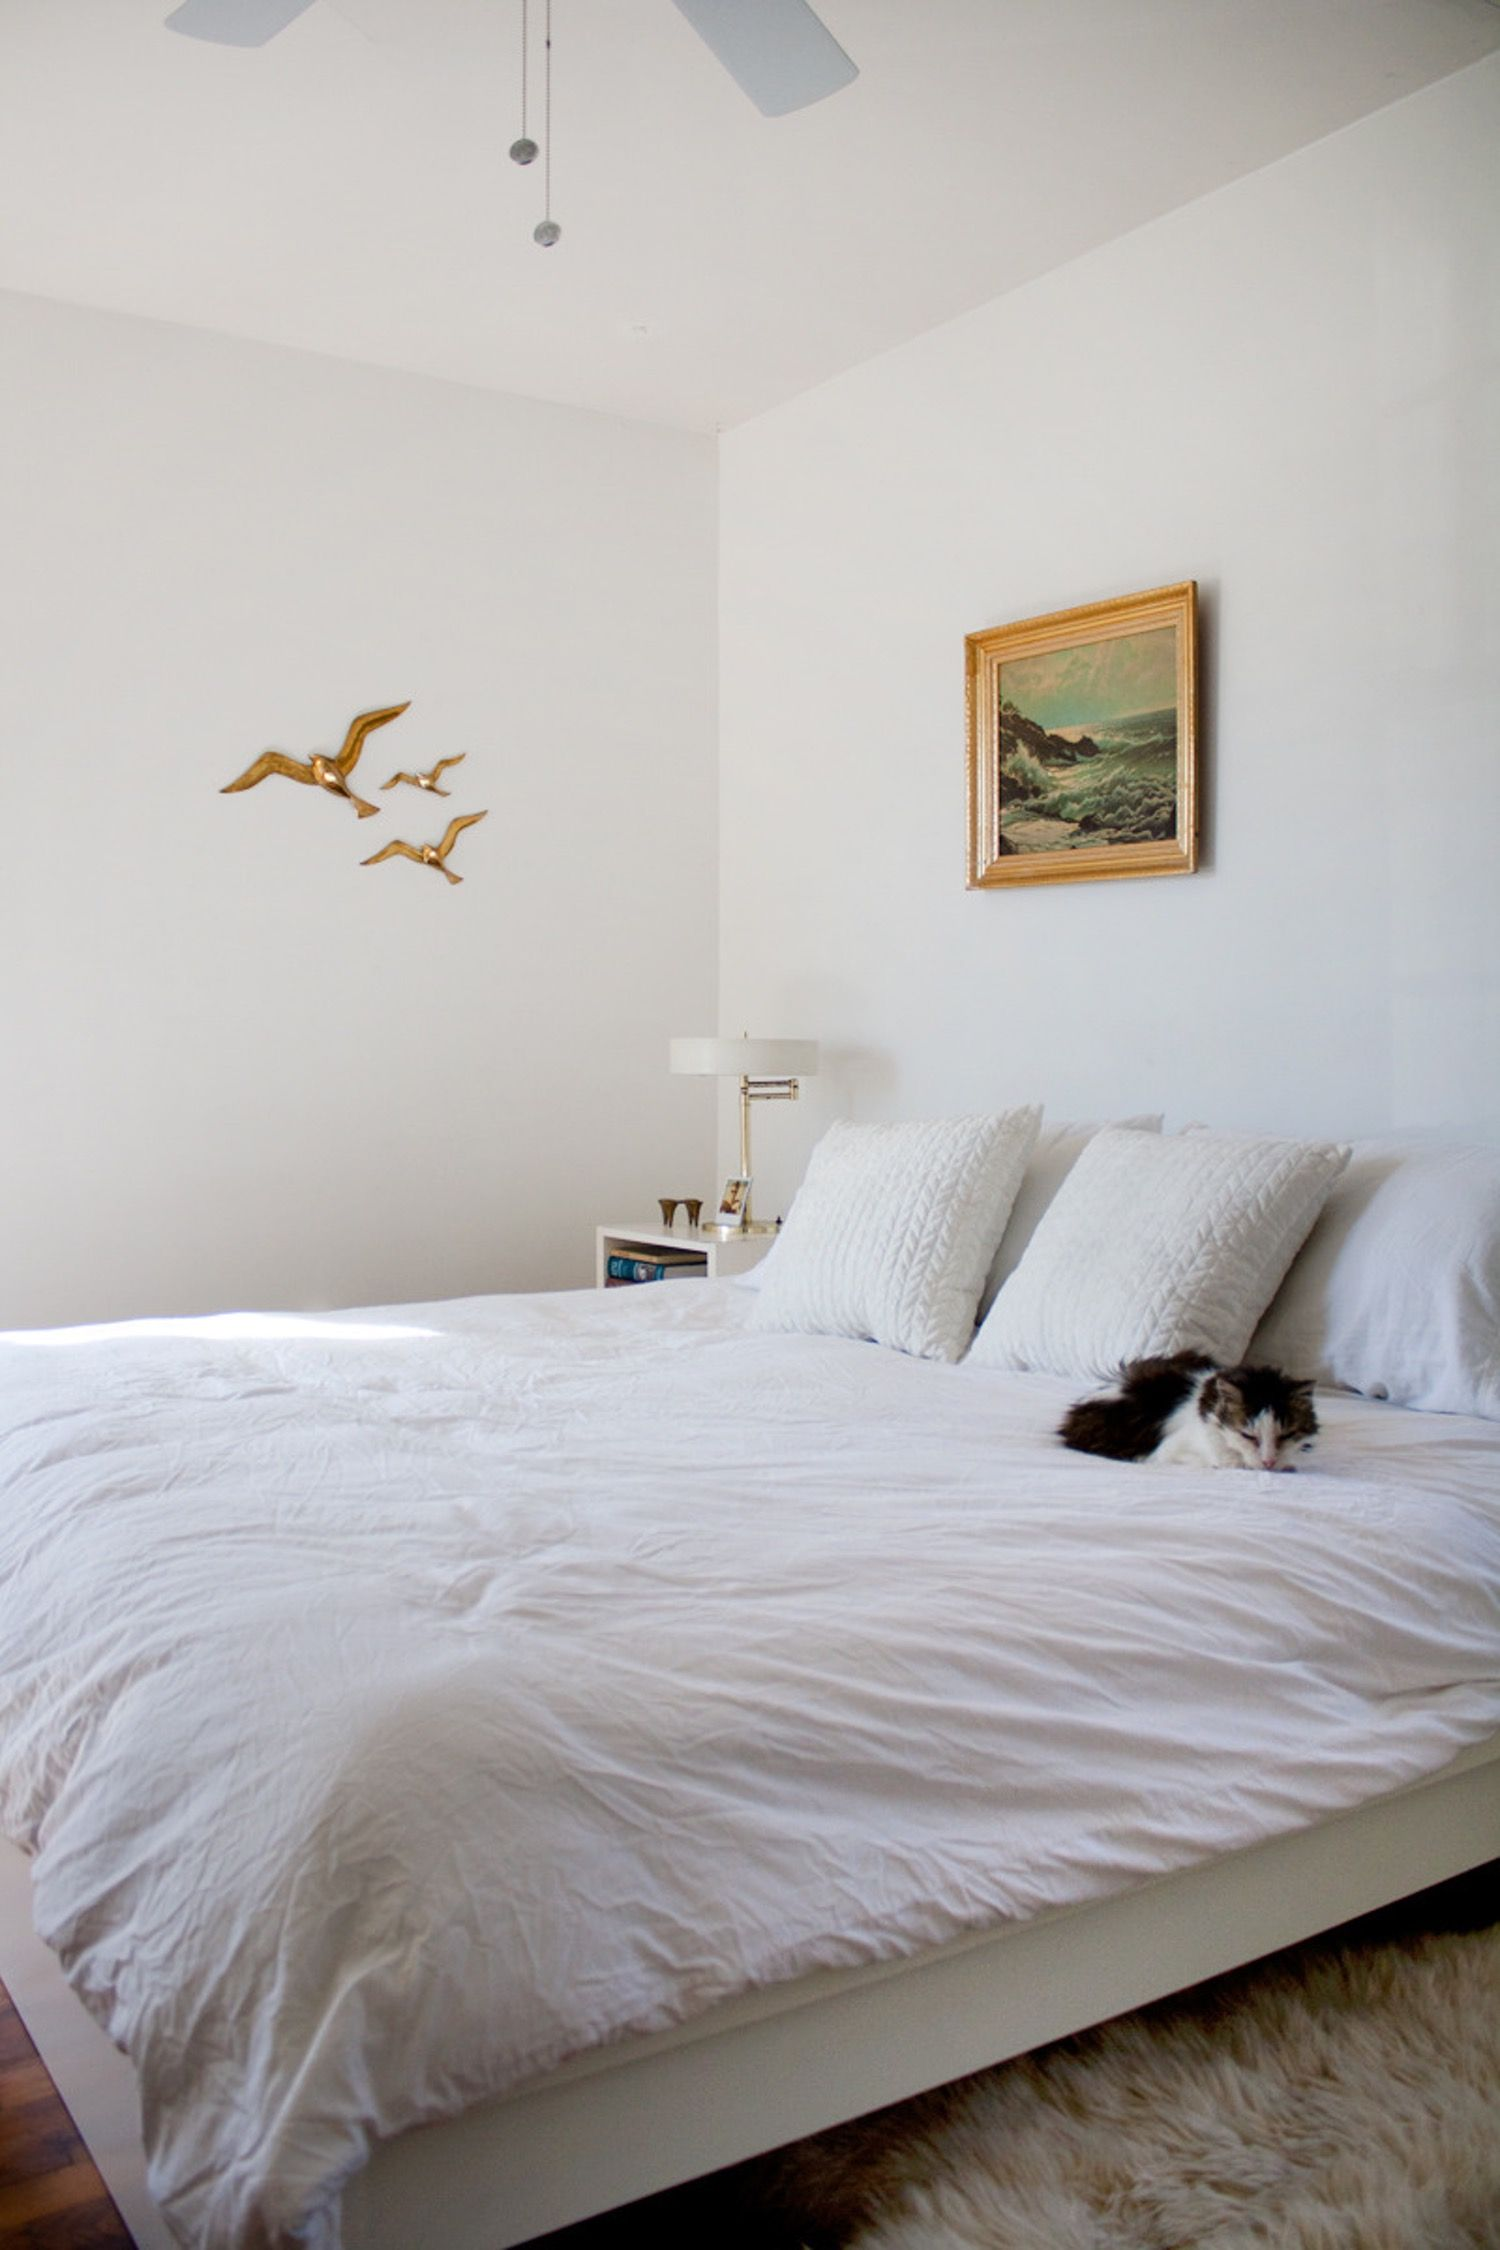 How To Clean Your Mattress Clean bedroom, Bedroom decor